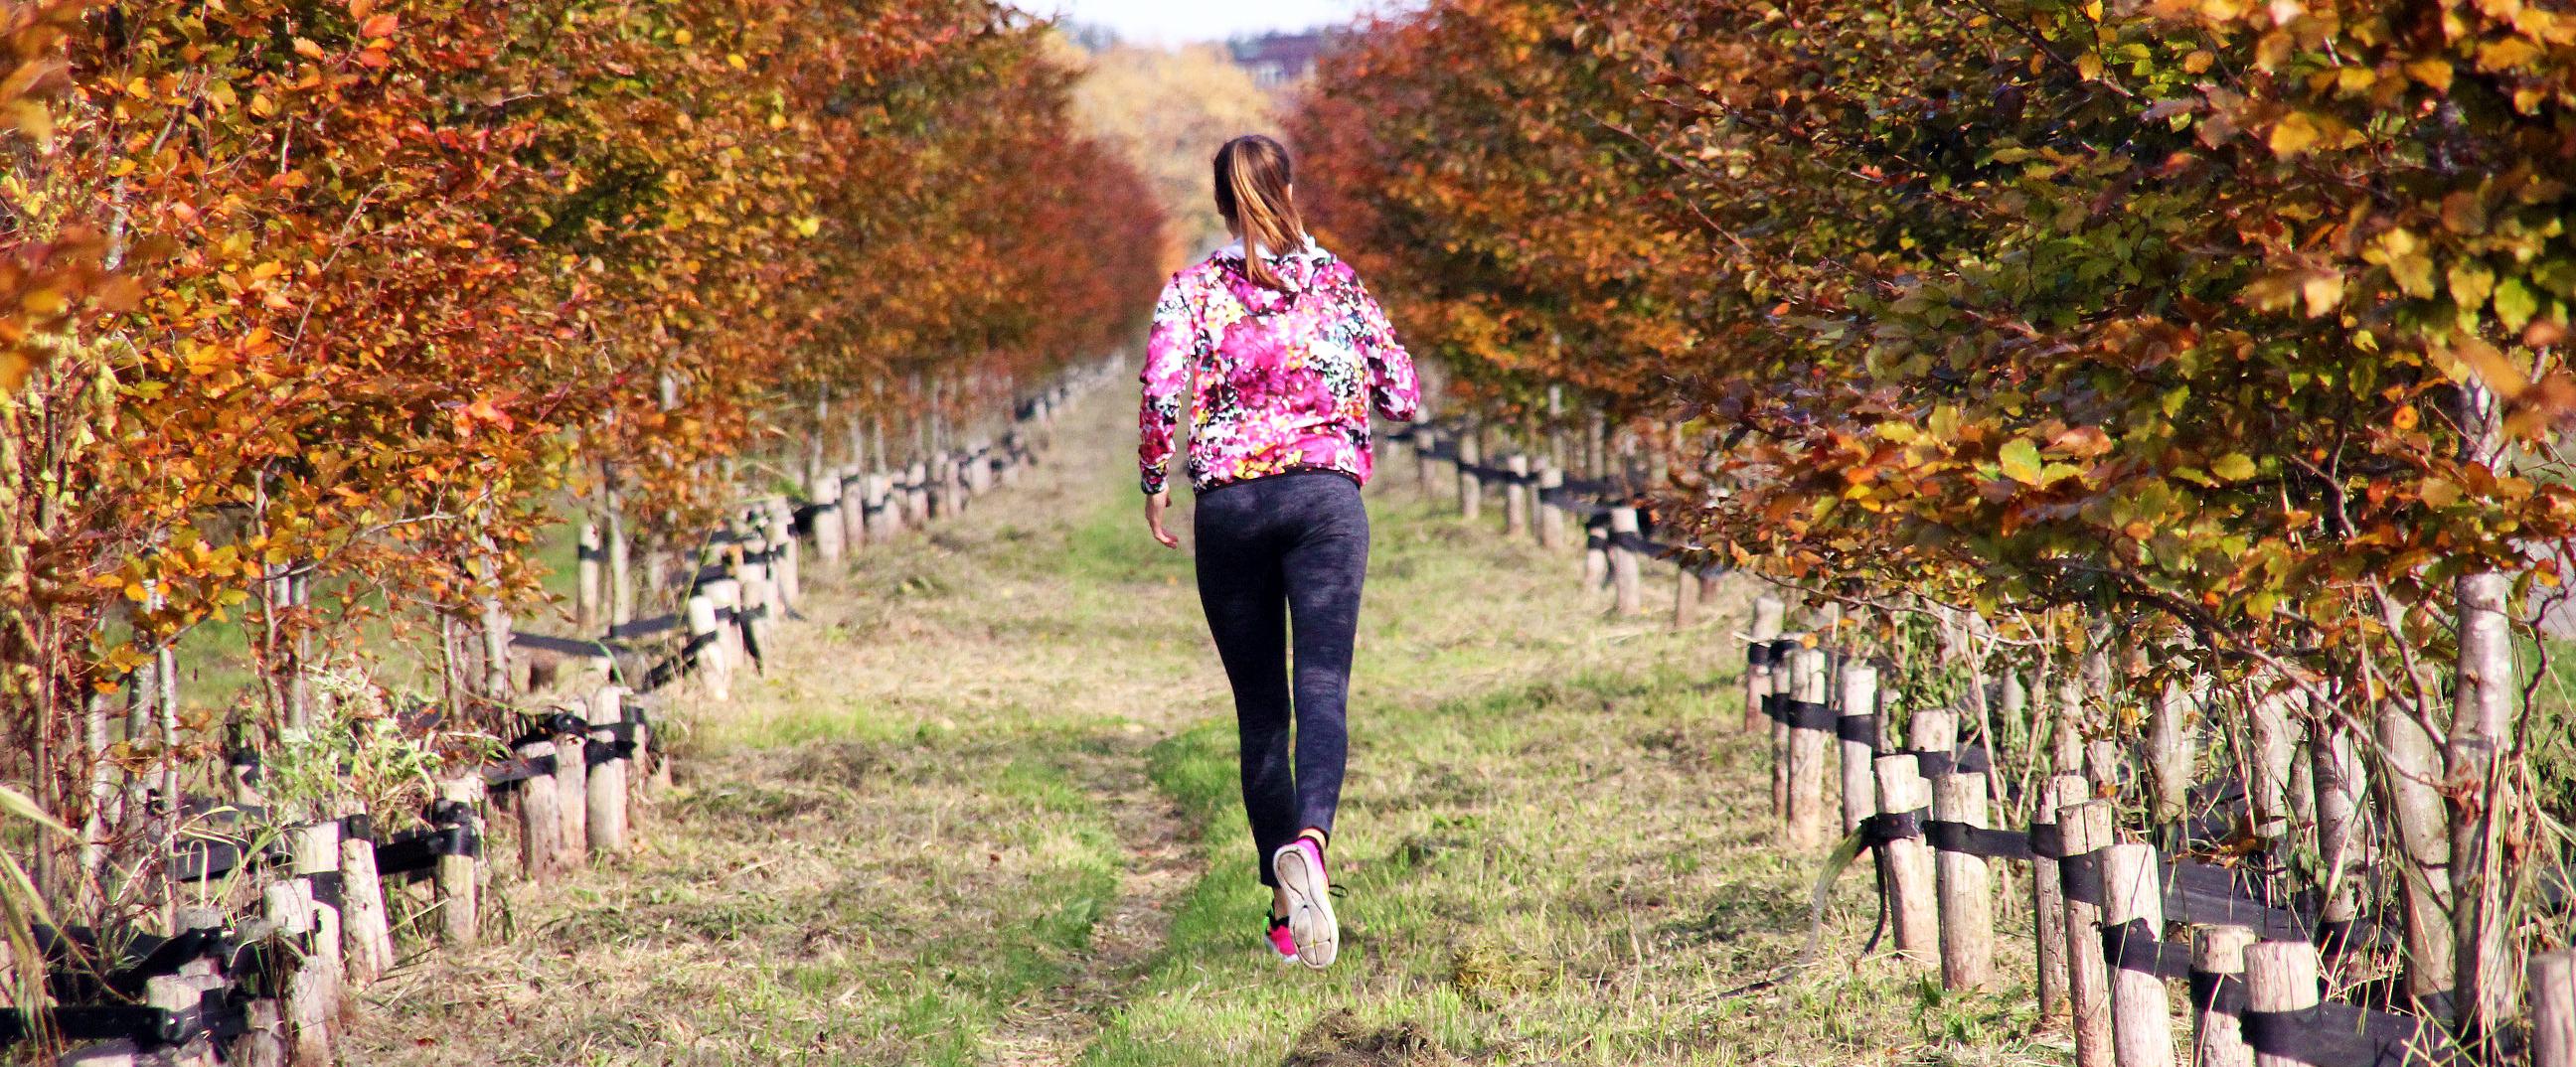 hardlopen-buiten-in-de-herfst-en-winter-kleding